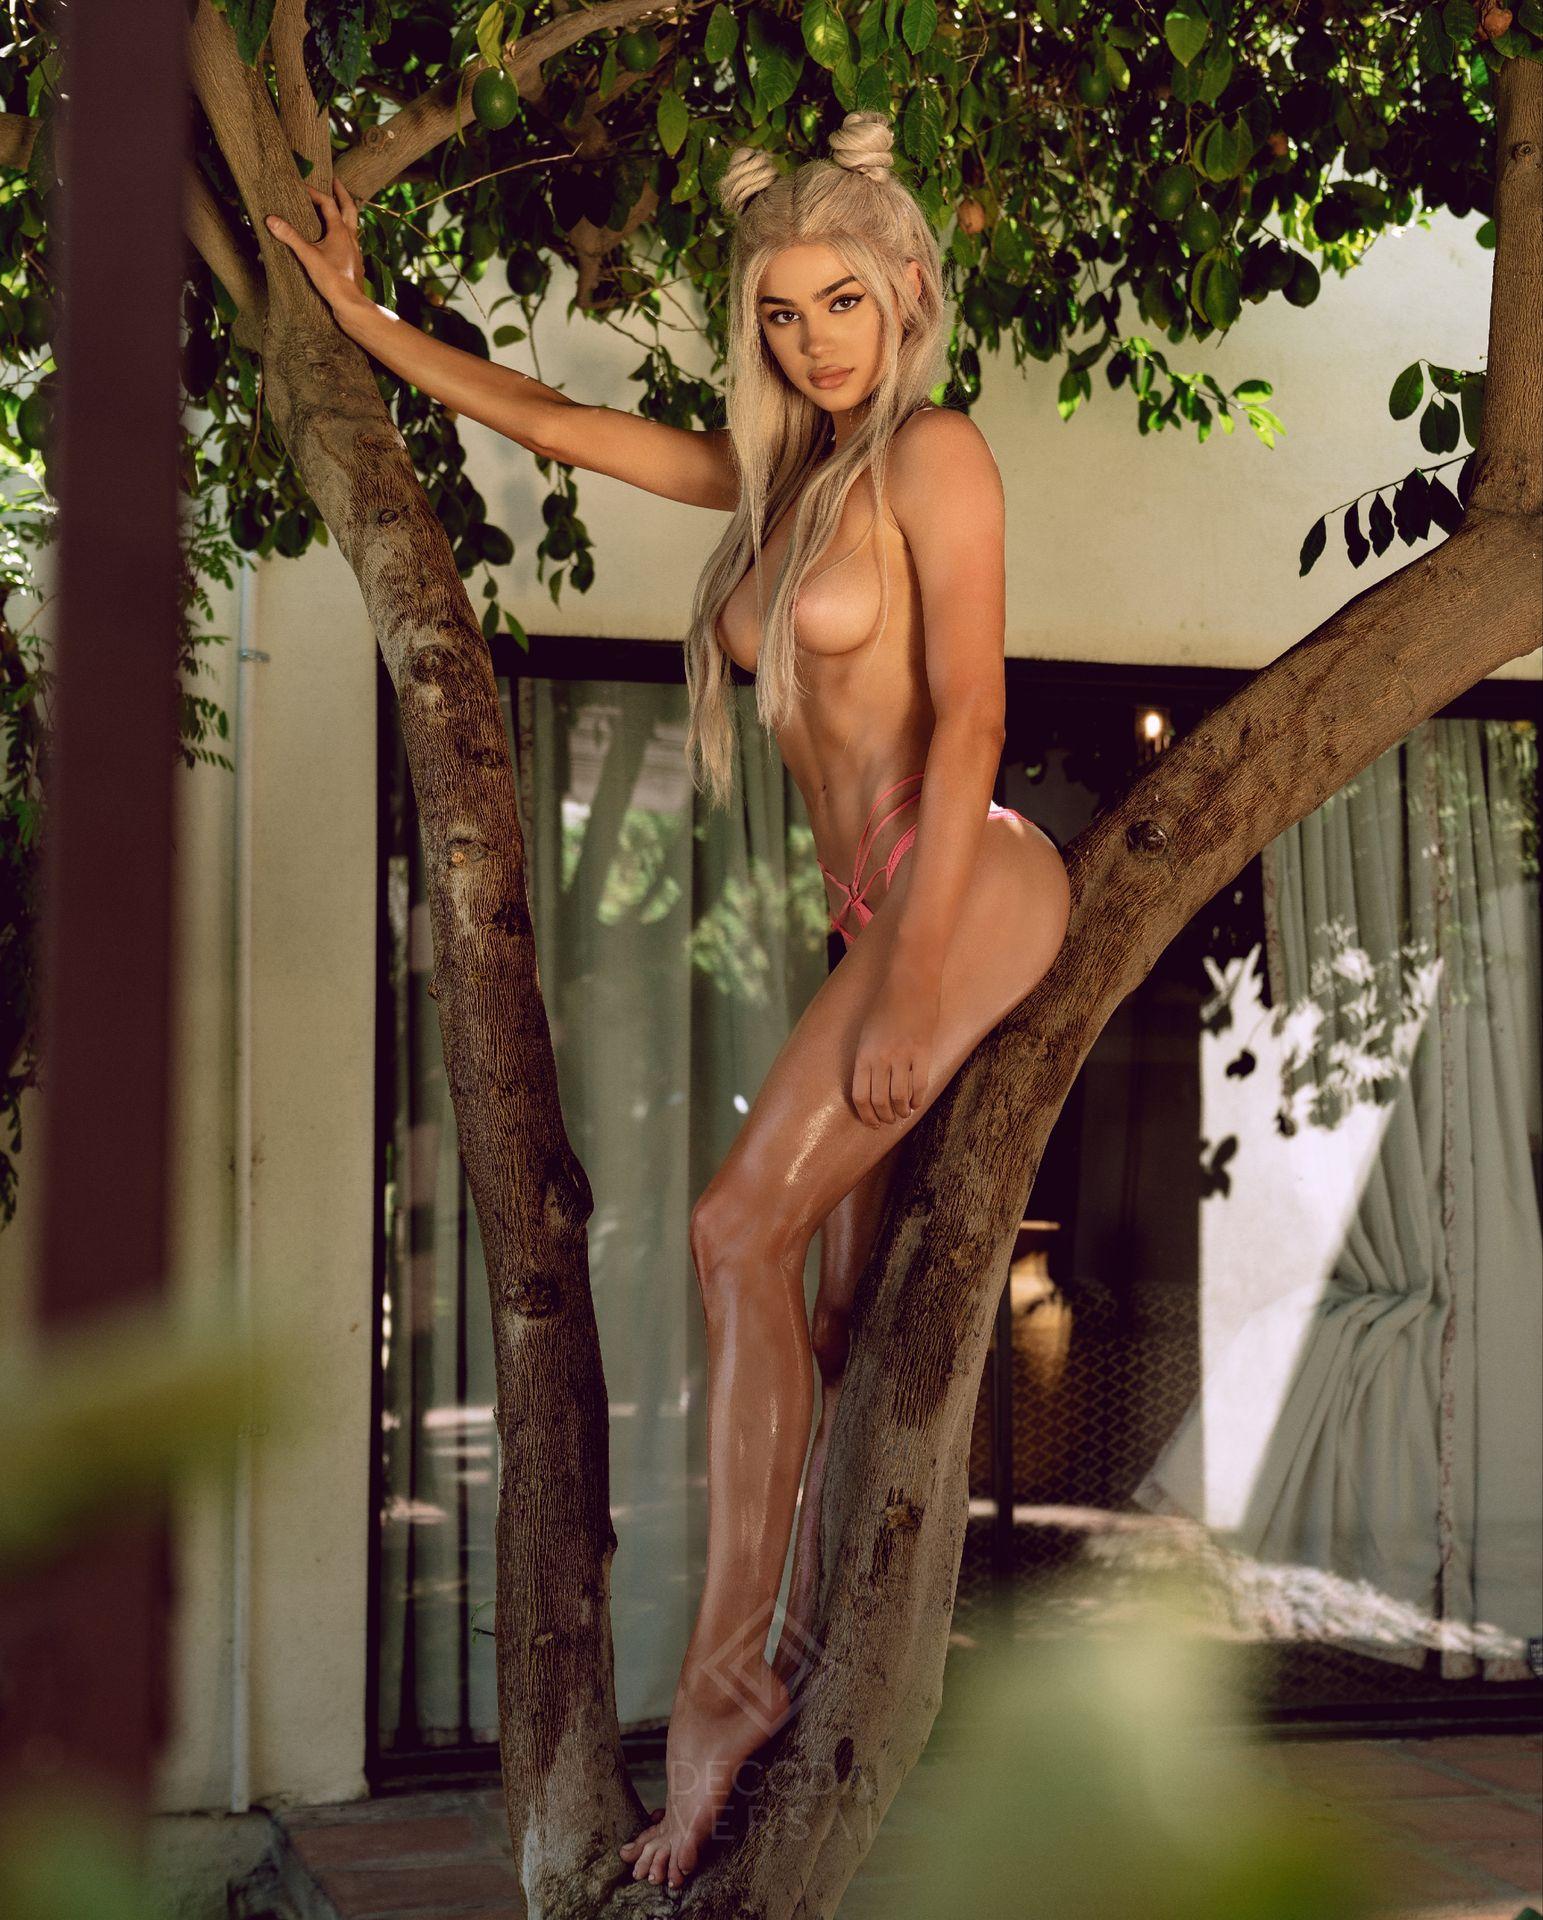 Kristen Hancher, Onlyfans Nudes Leaks 0008